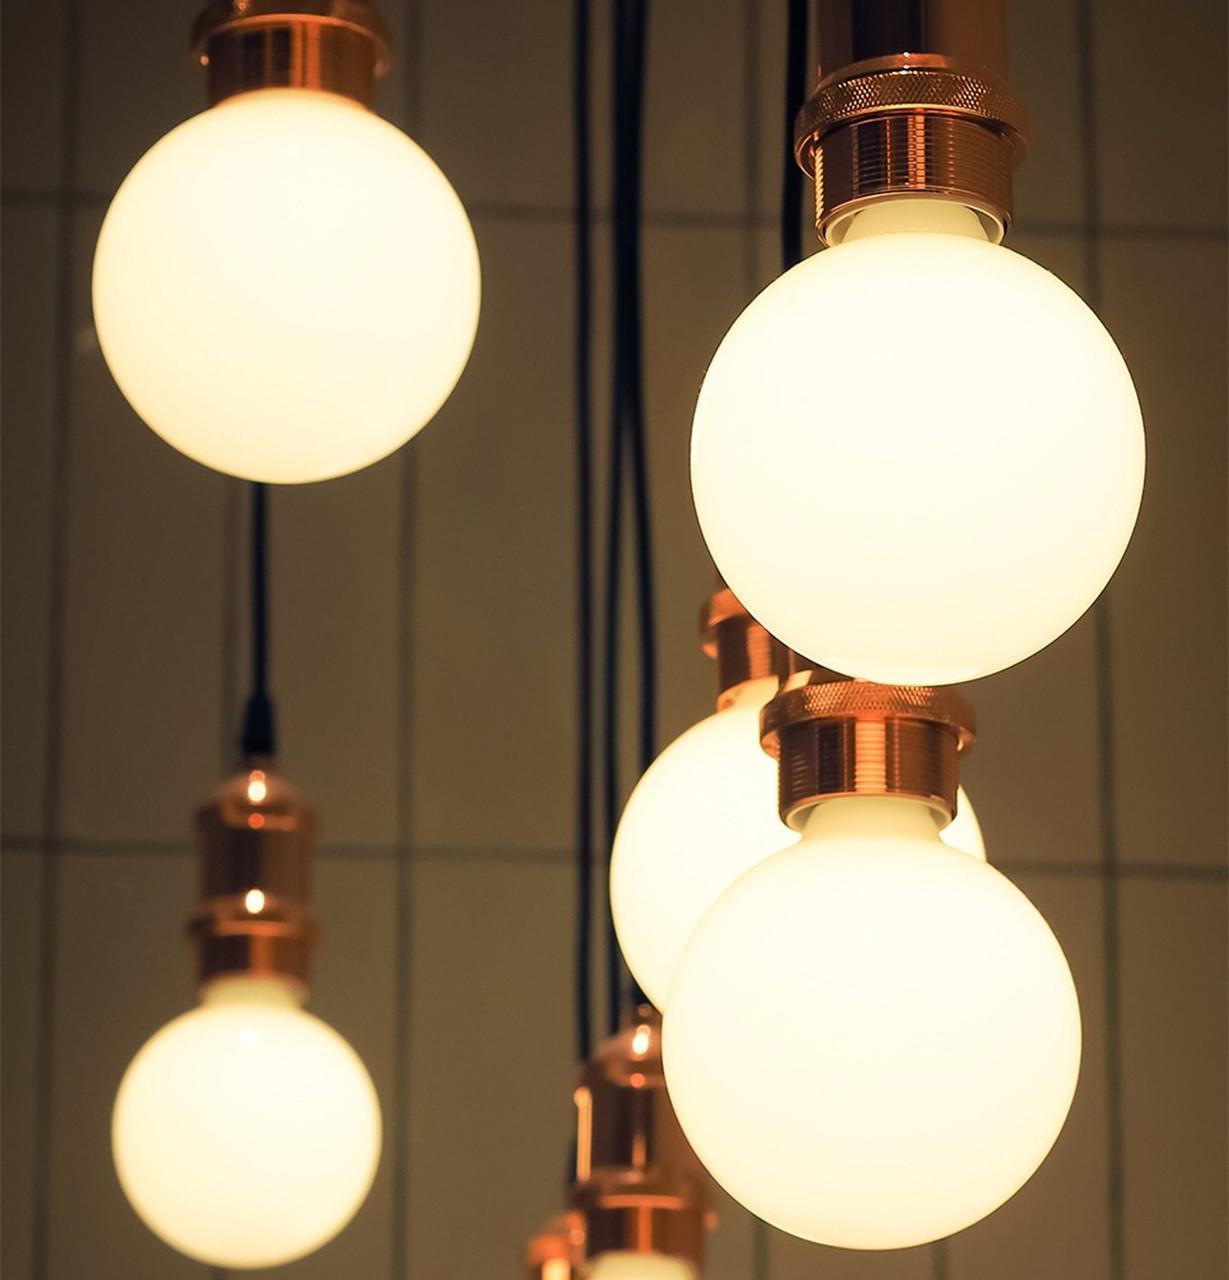 Crompton Lamps LED Globe E27 Light Bulbs